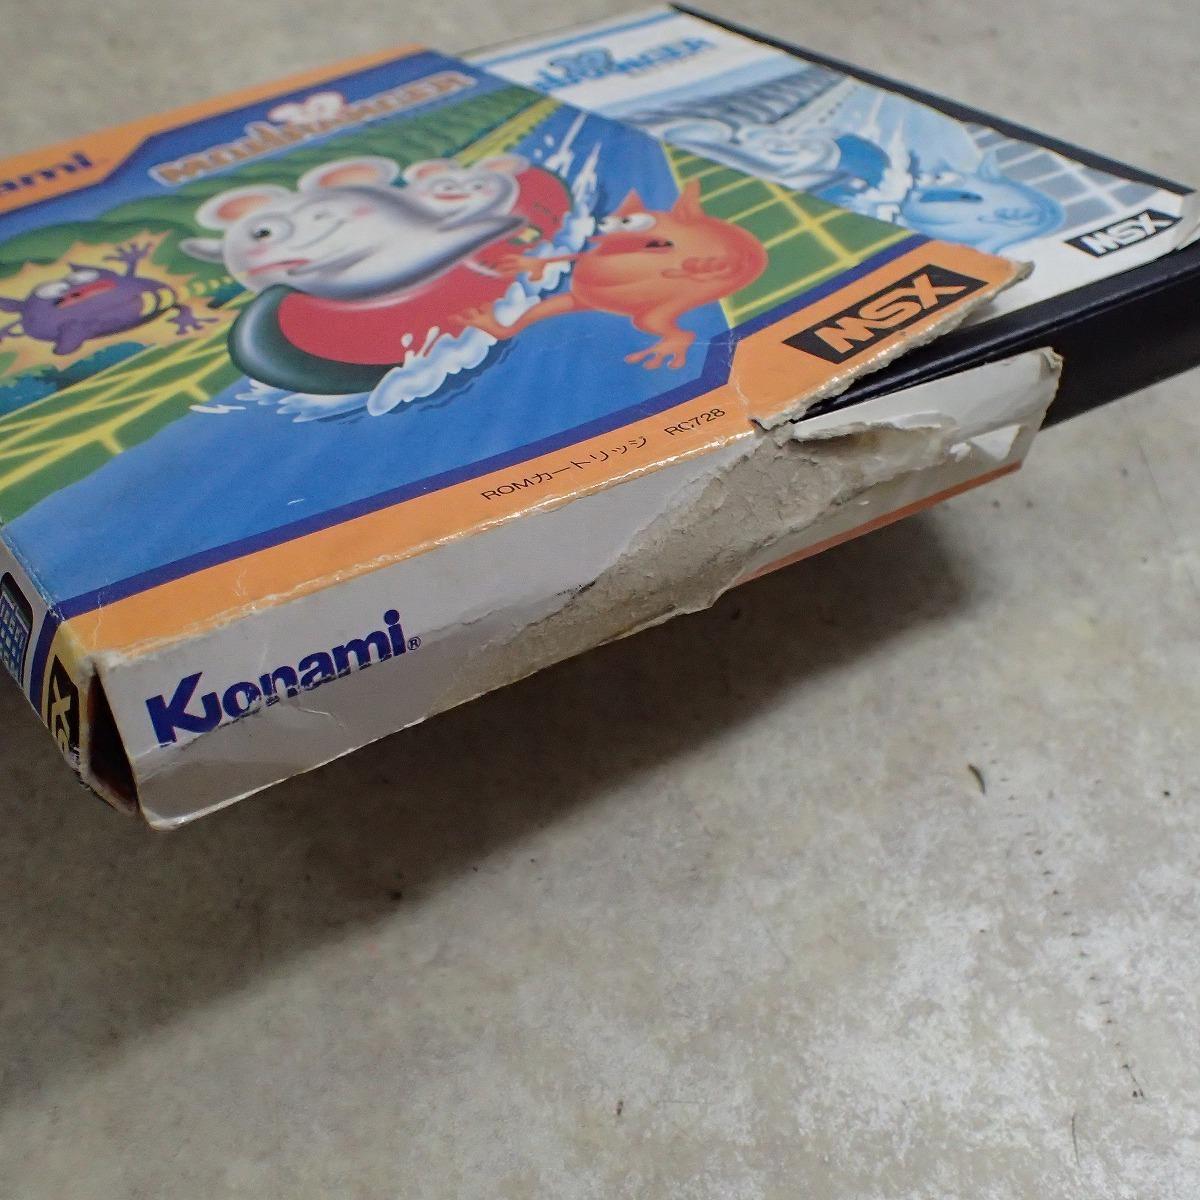 MSX ROM わんぱくアスレチック/ロードファイター/スカイジャガー/コナミ・ハイパーラリー/モピレンジャー等KONAMIソフト10本セット【20_画像4